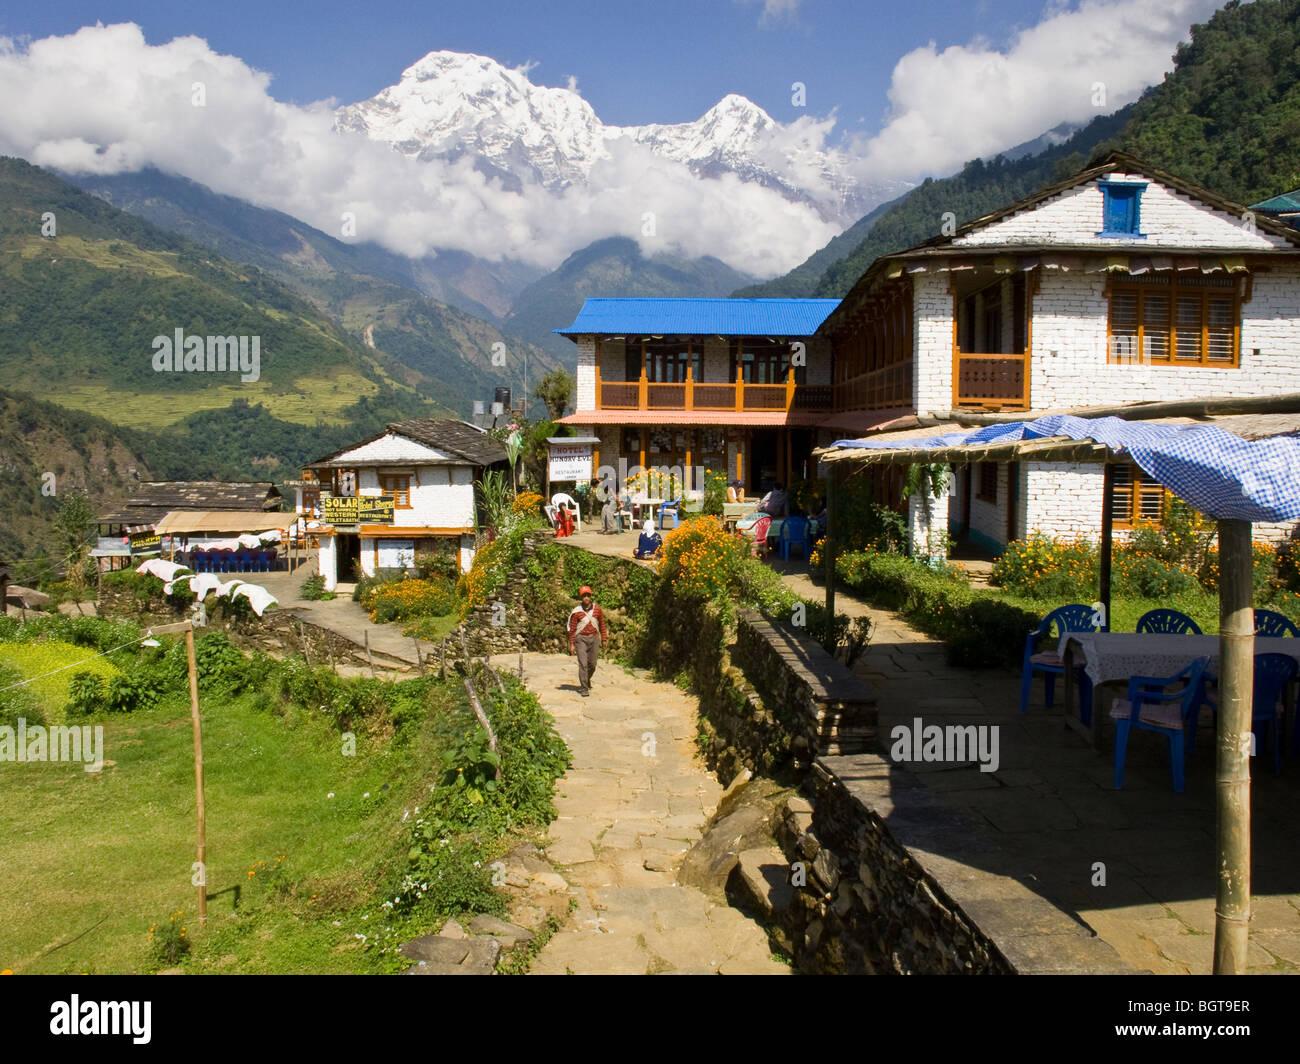 Photo taken while trekking through the town of Landruk in the Annapurna region, Nepal. - Stock Image